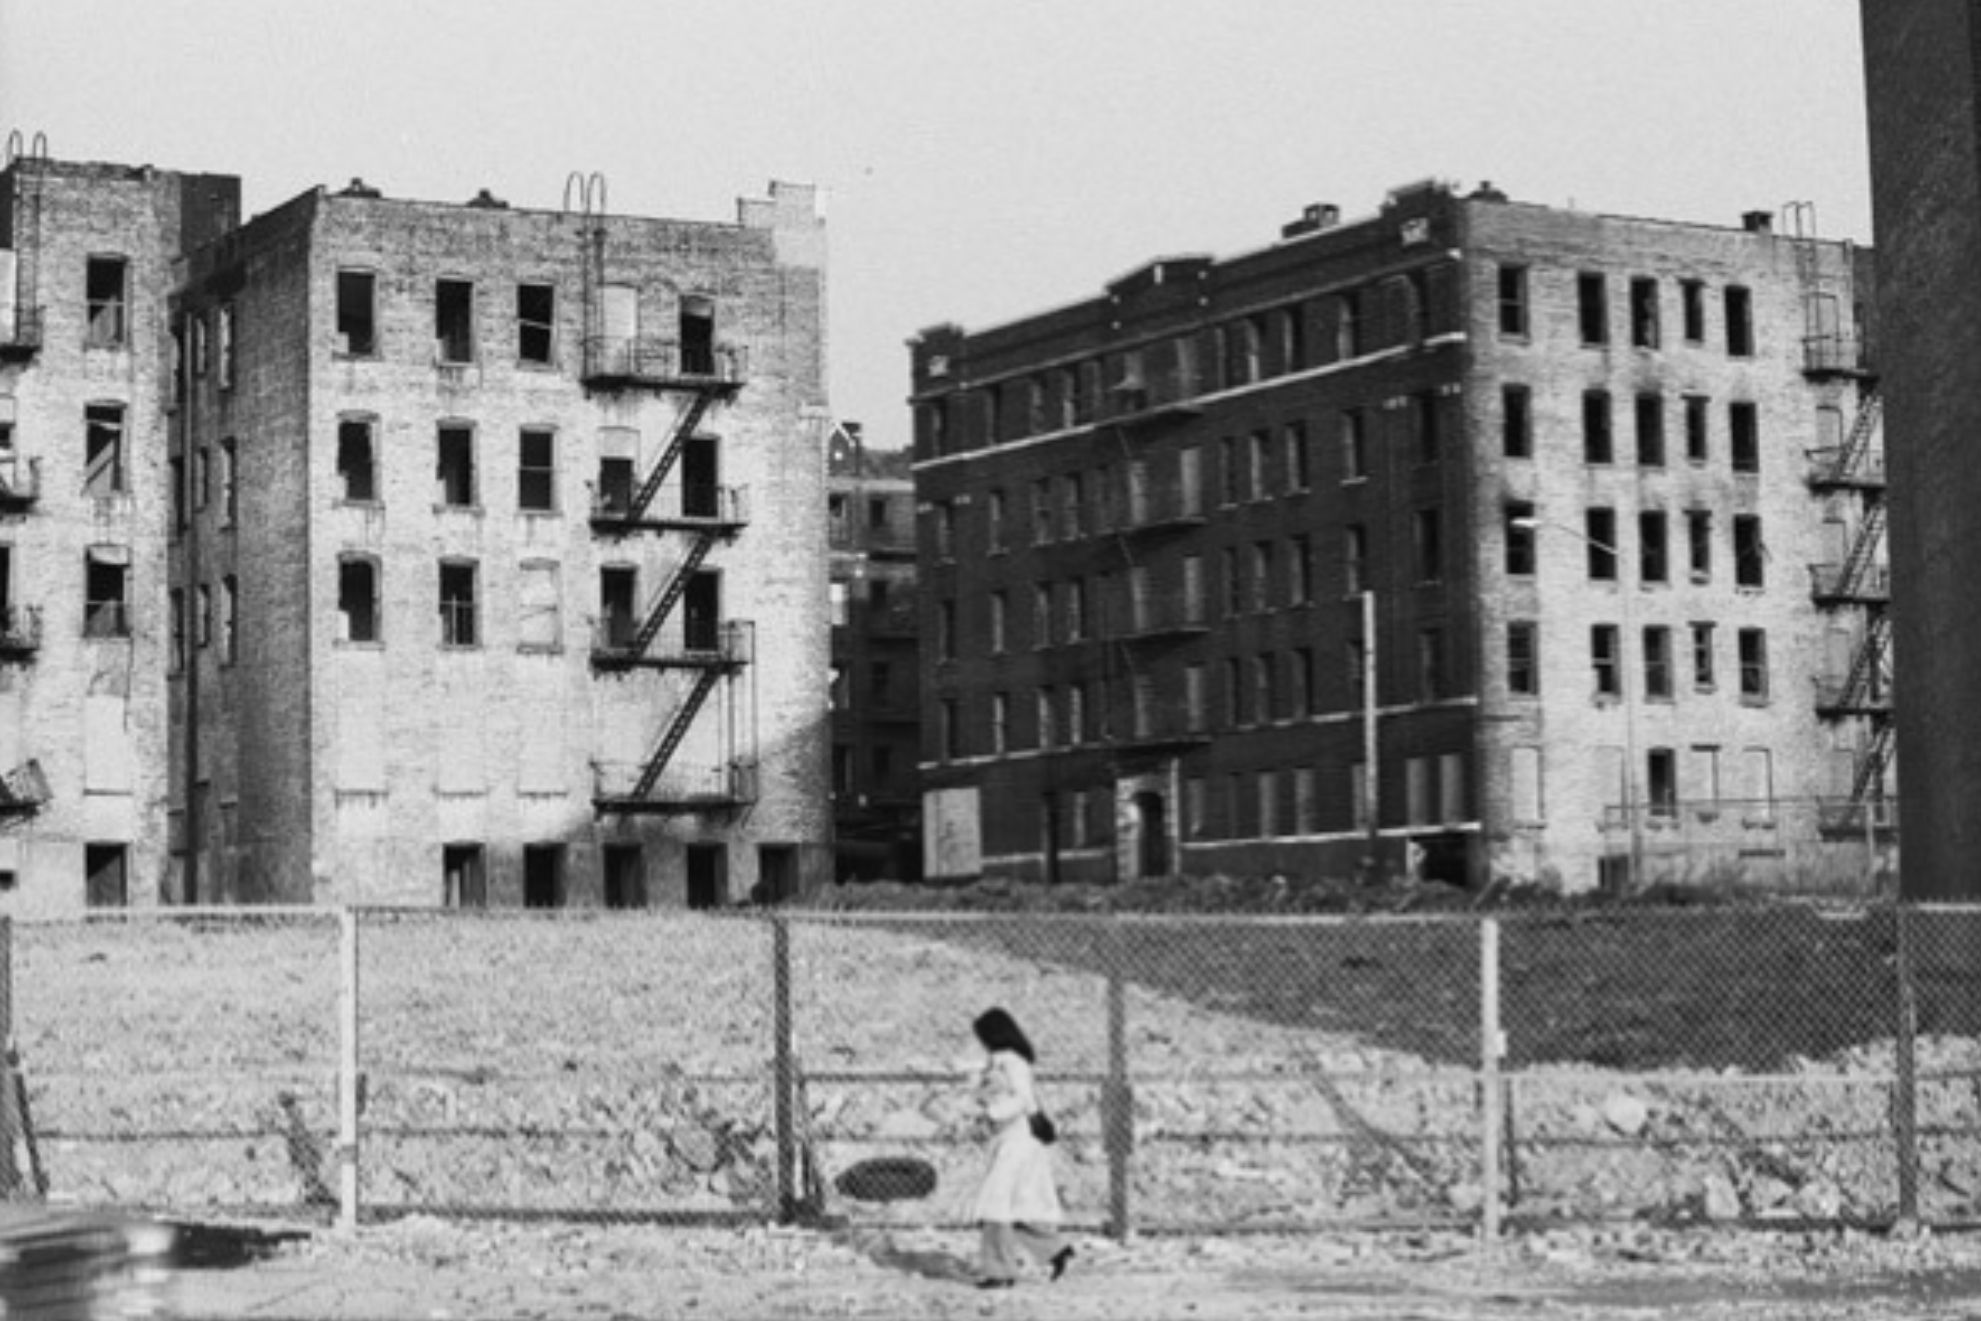 East 164th Street in 1980